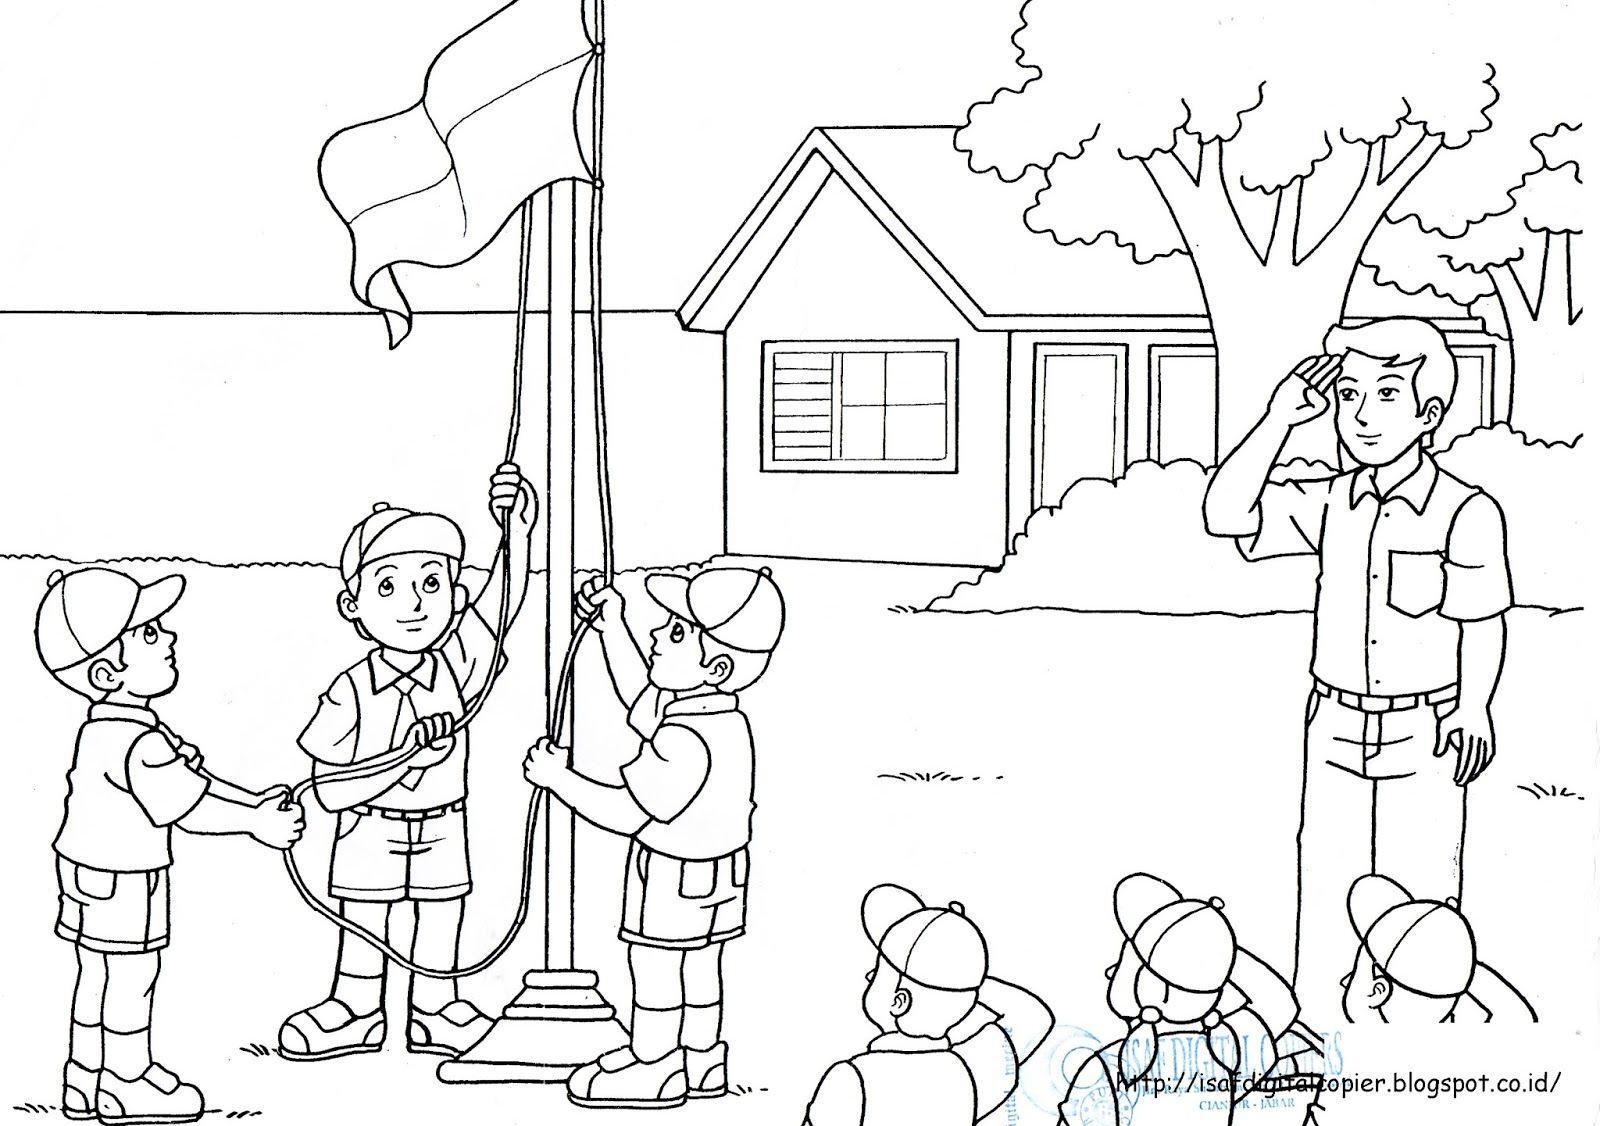 gambar mewarnai anak baru gambar mewarnai upacara bendera di 2020 bendera buku mewarnai warna pinterest